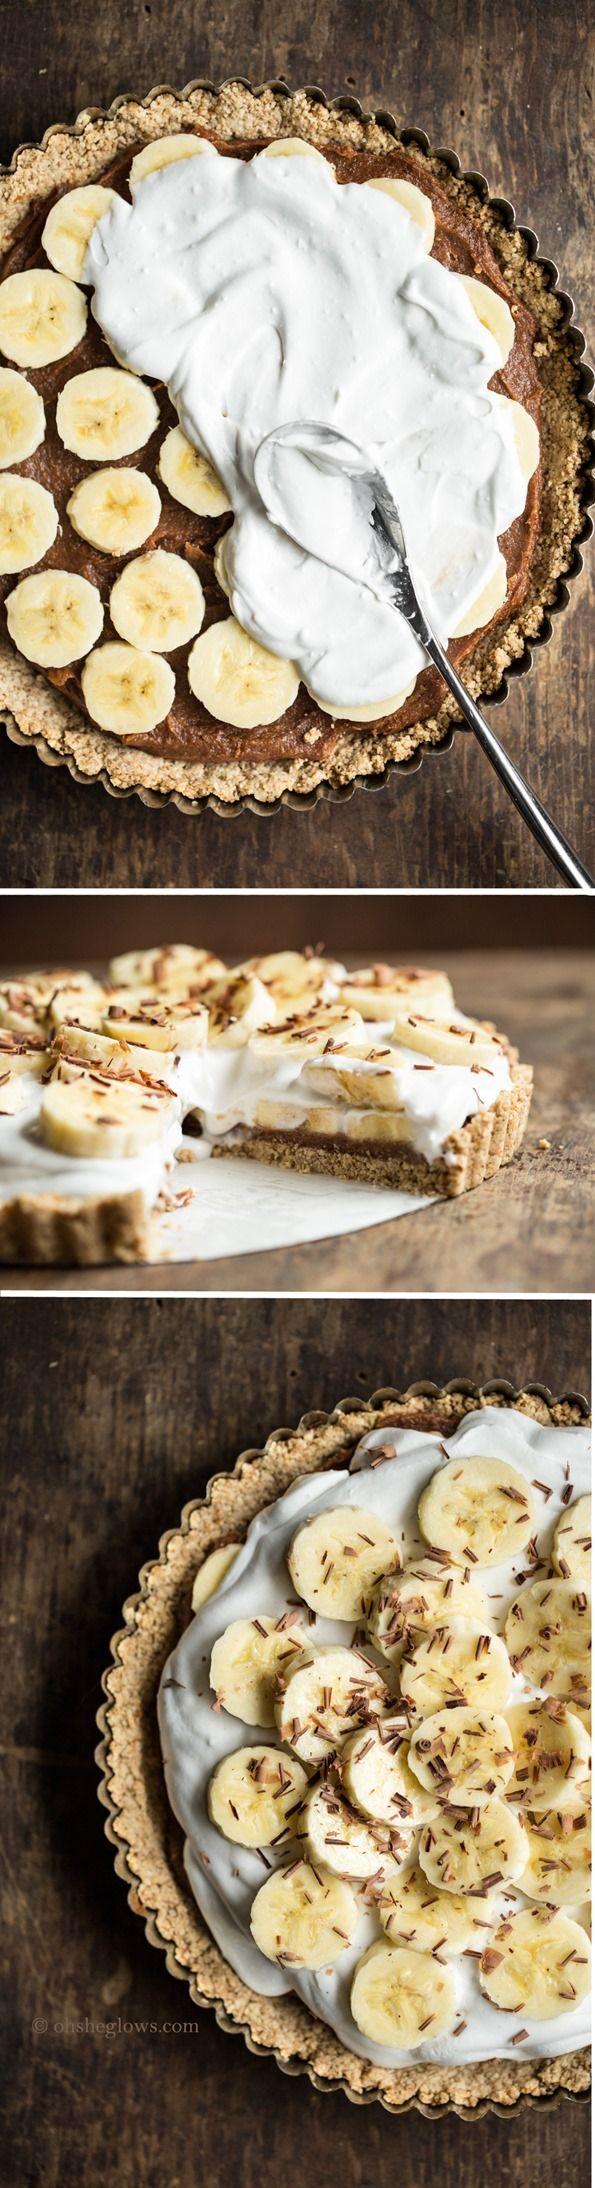 Banoffee Pie, dairy-free, vegan, gluten-free, refined sugar-free.